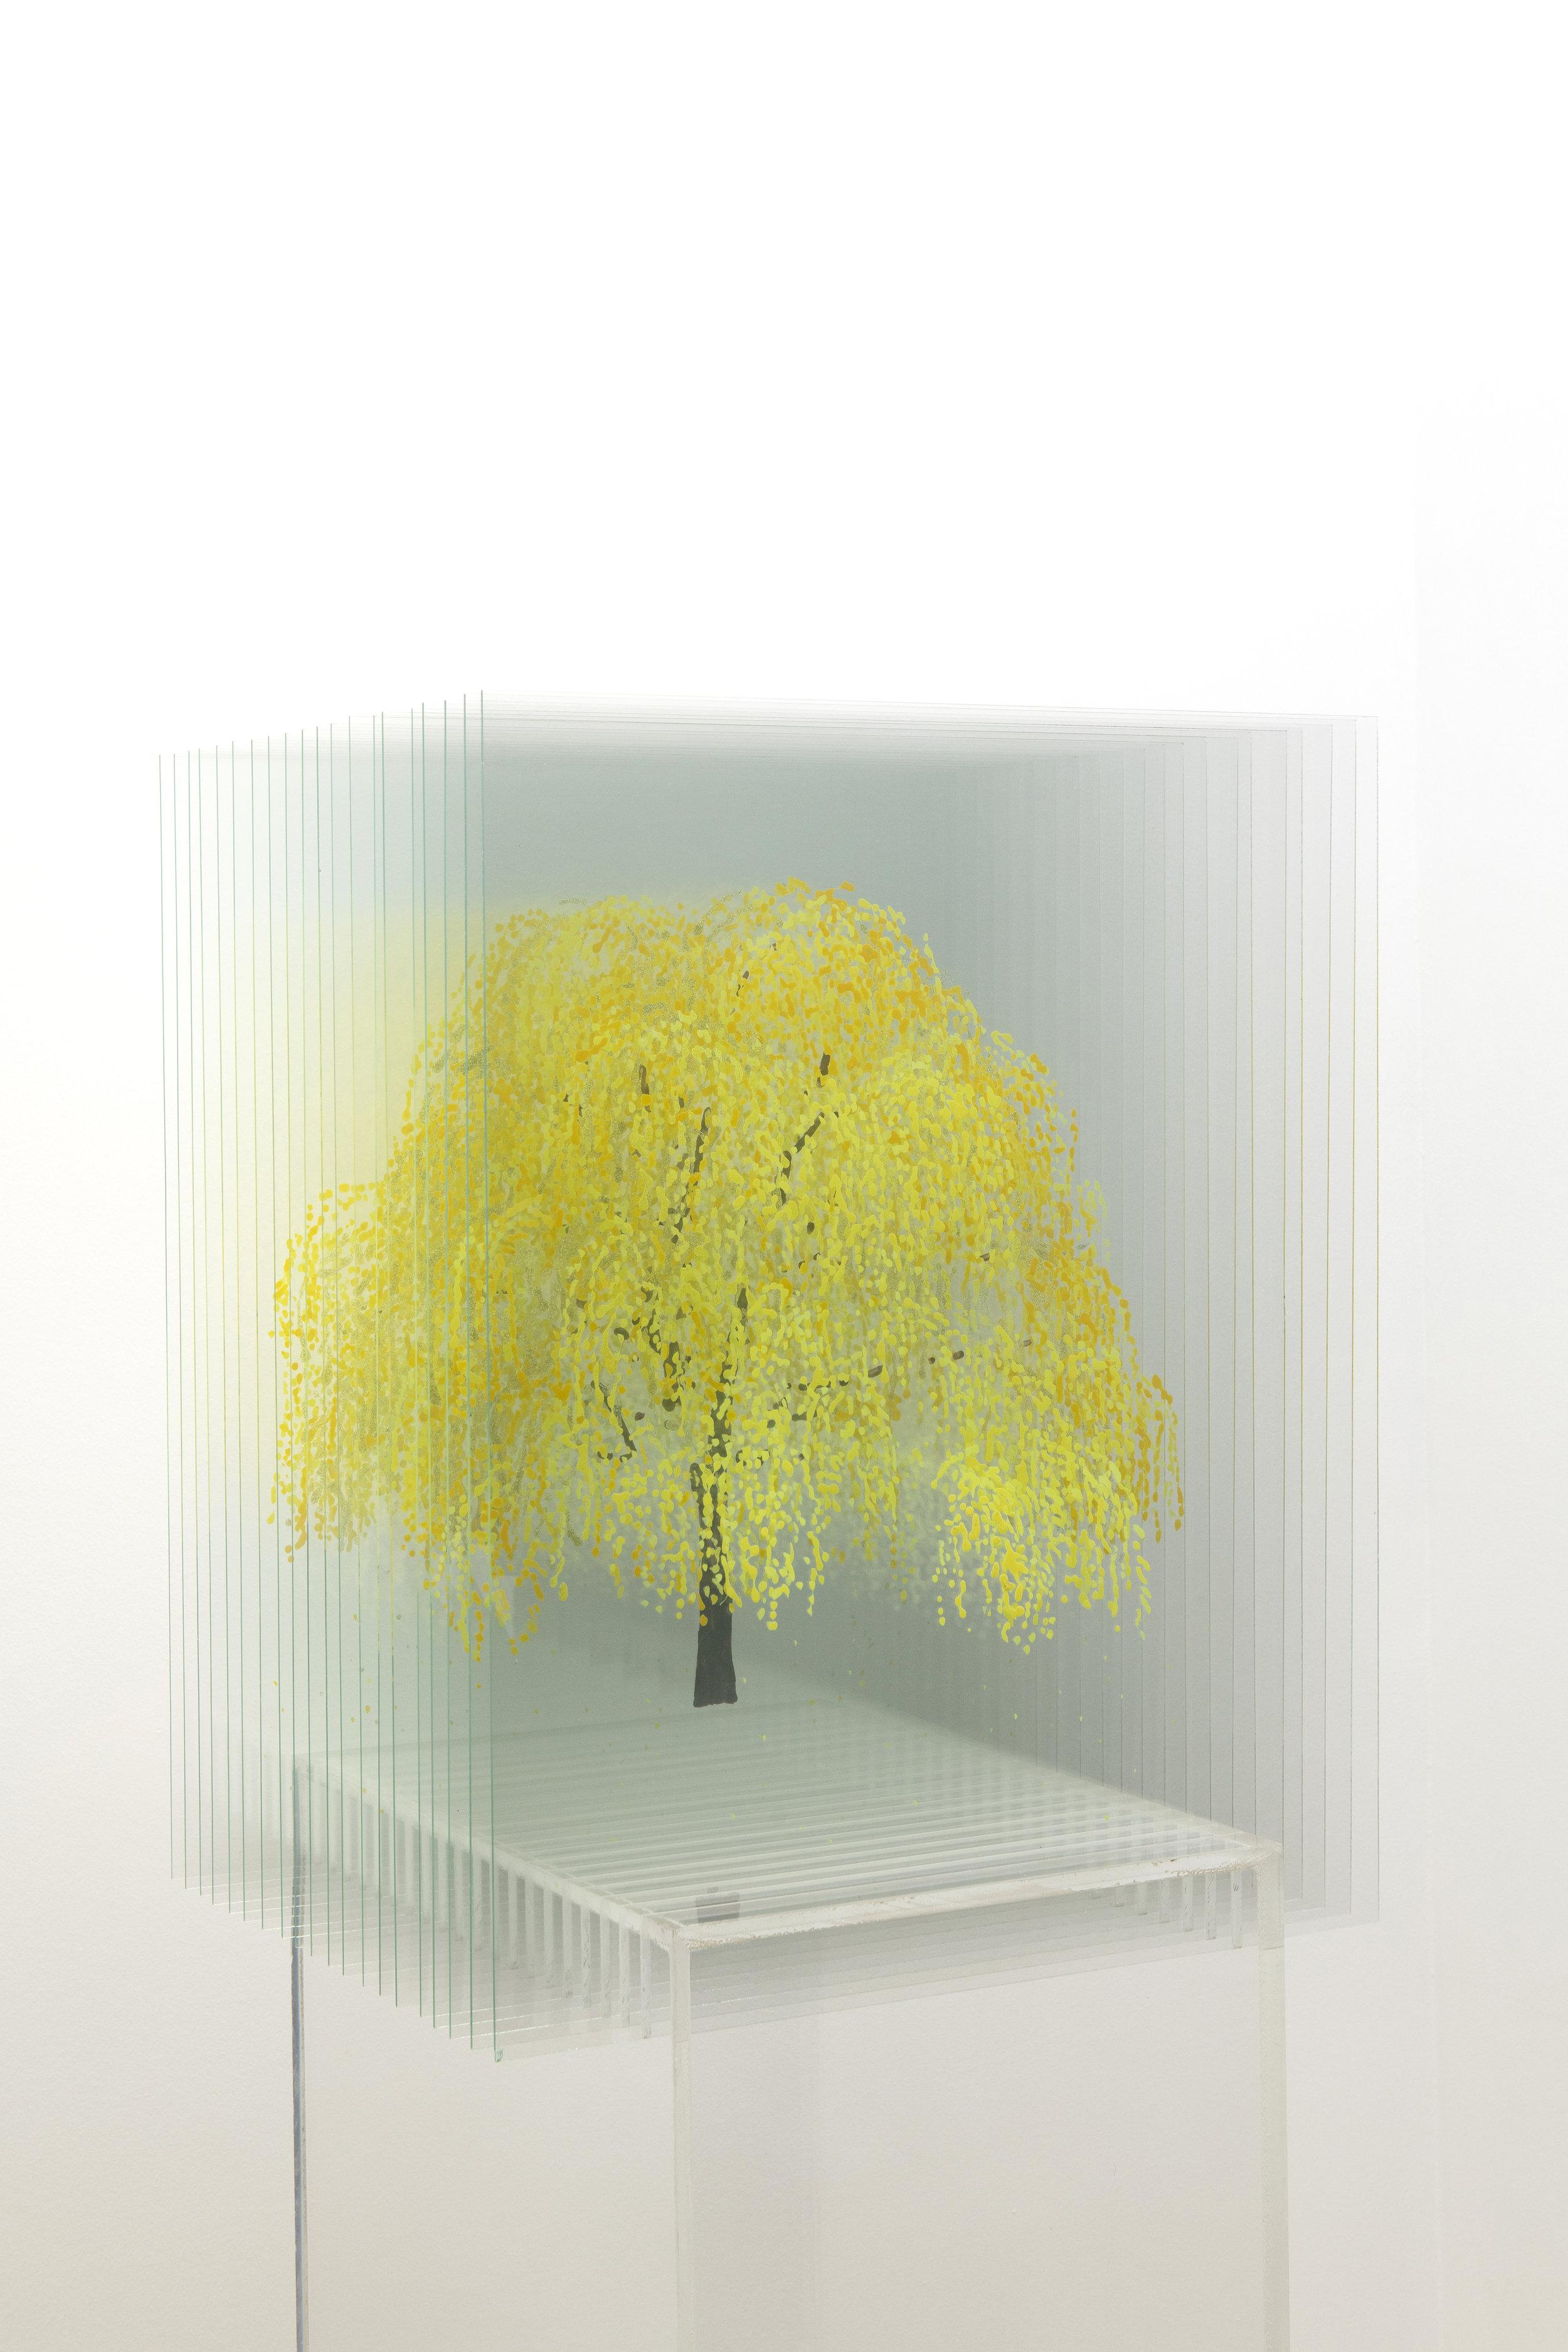 Anna Laudel Gallery,Ardan Özmenoglu, Fall in Love, 2018, nail polish on glass panels and plexi base, 59x18x17in,image 2.jpg